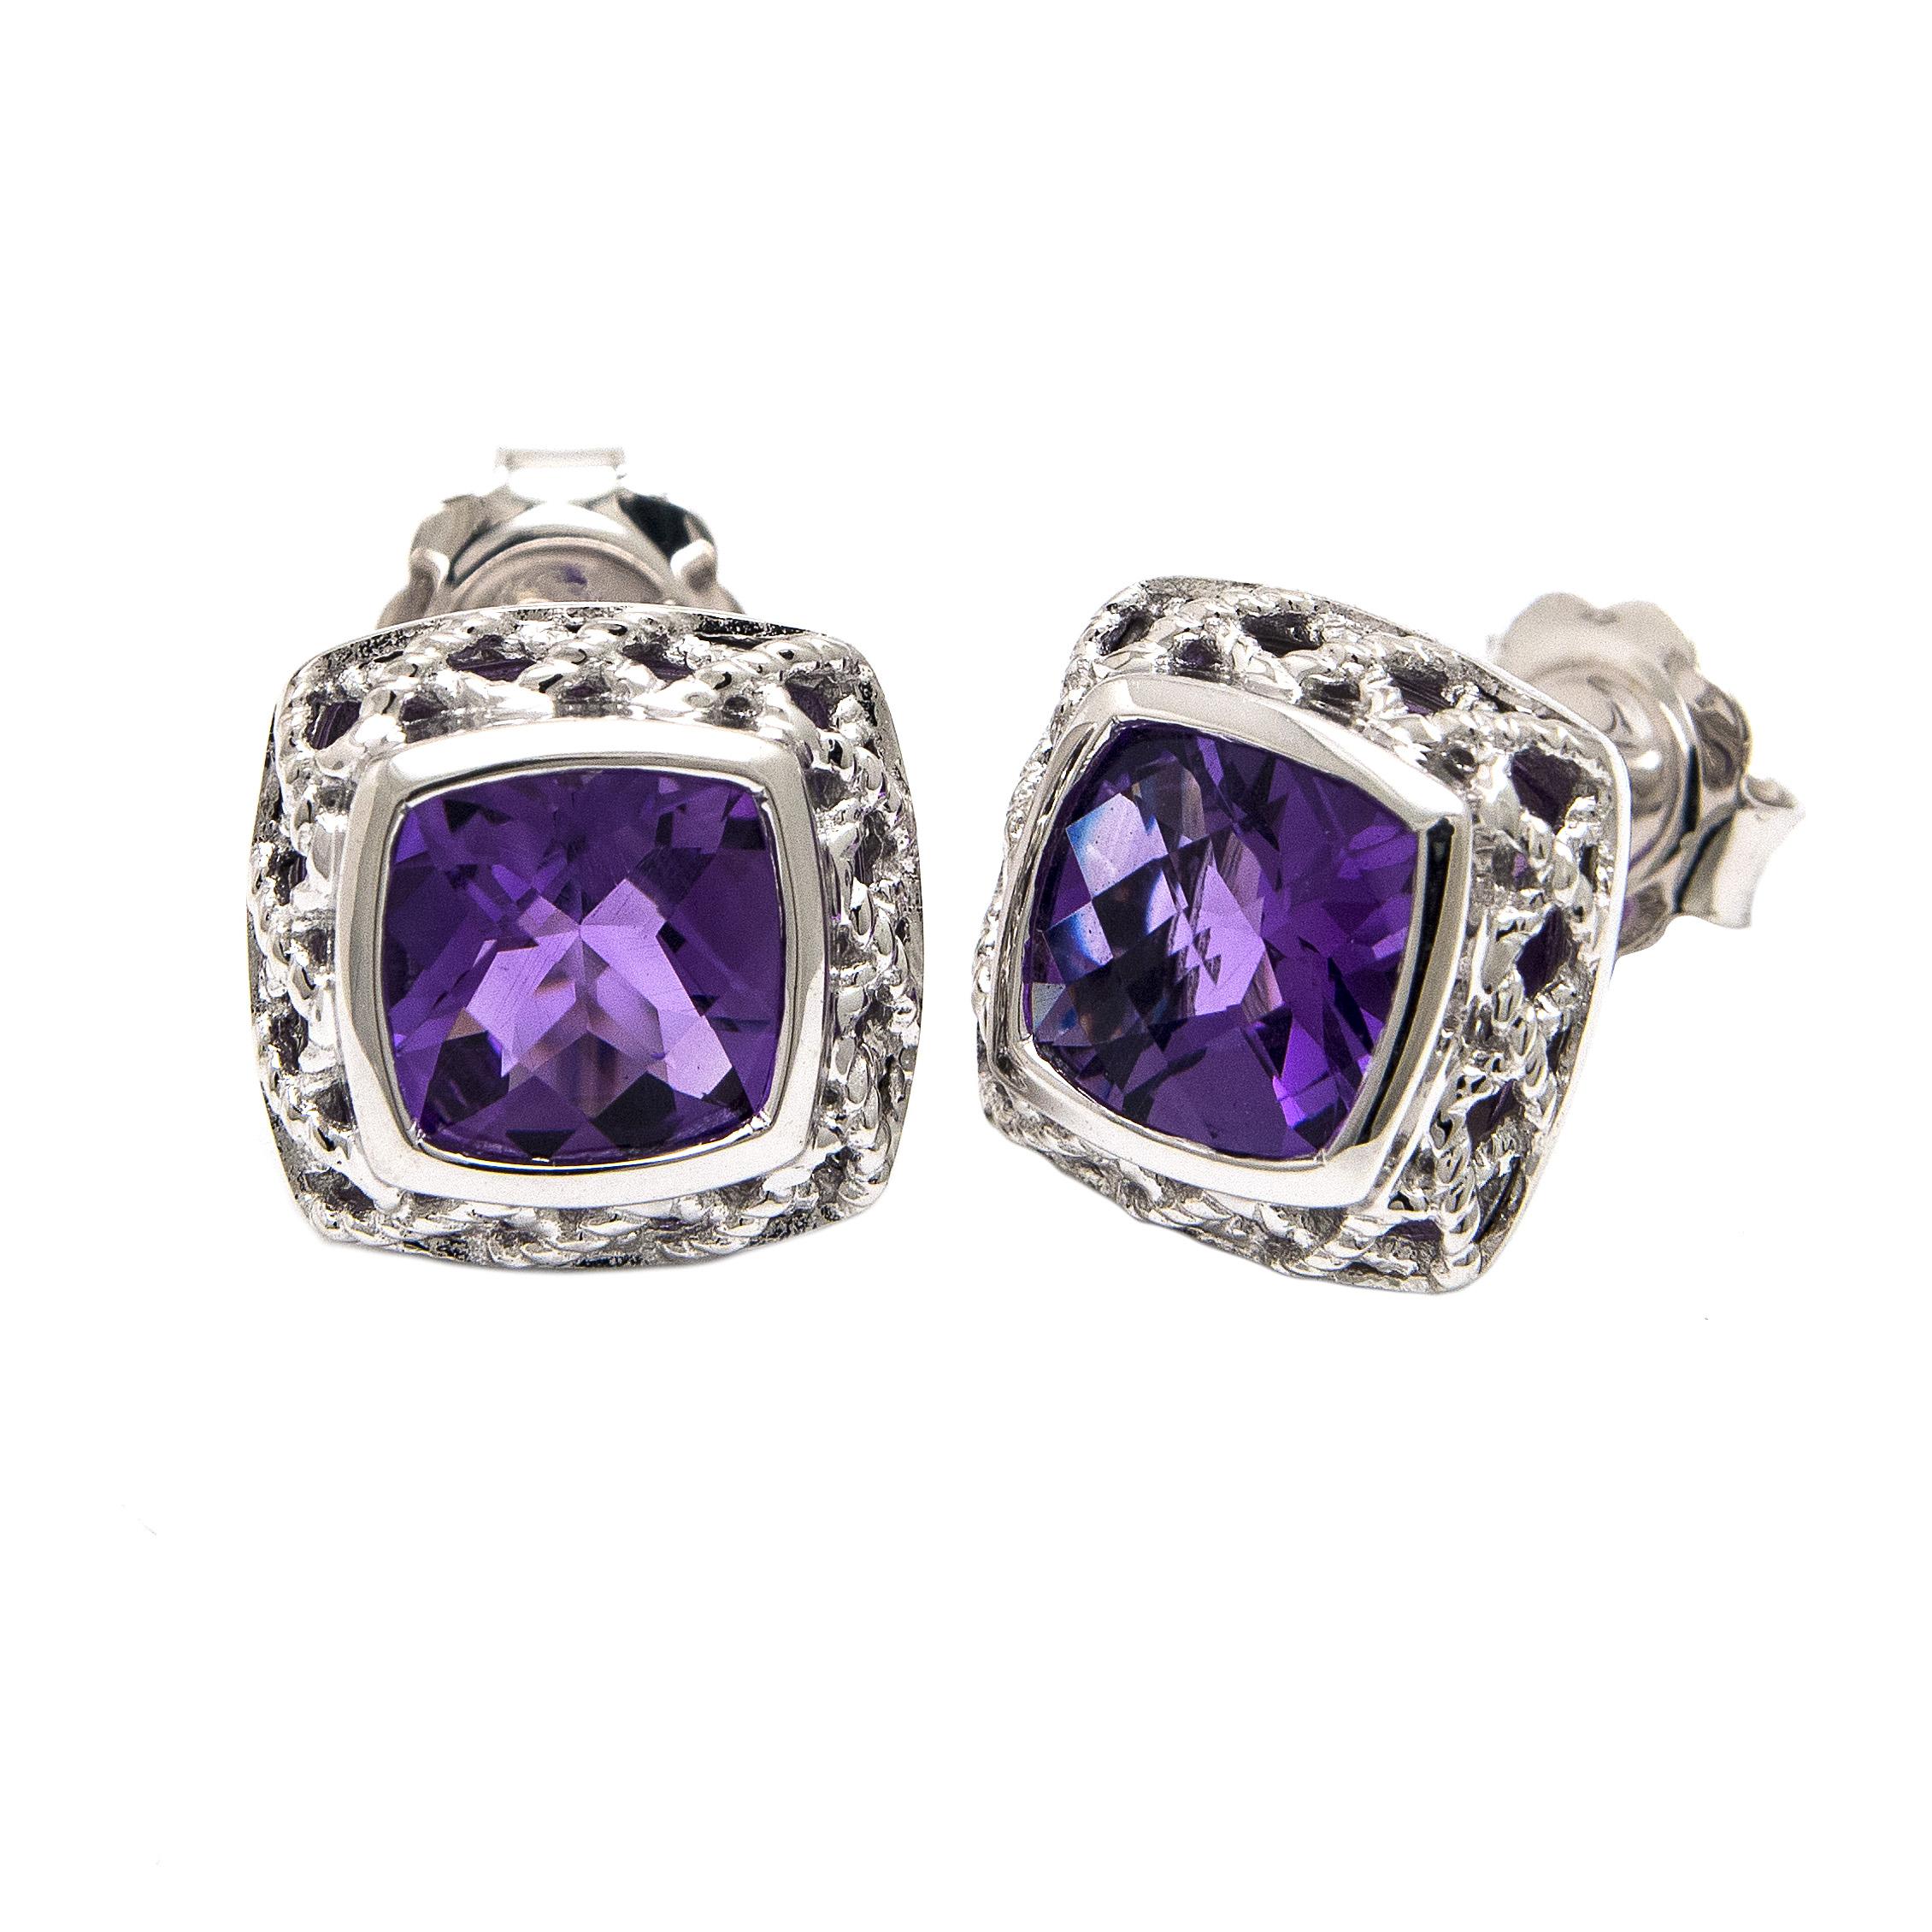 Rioja Amethyst Earrings